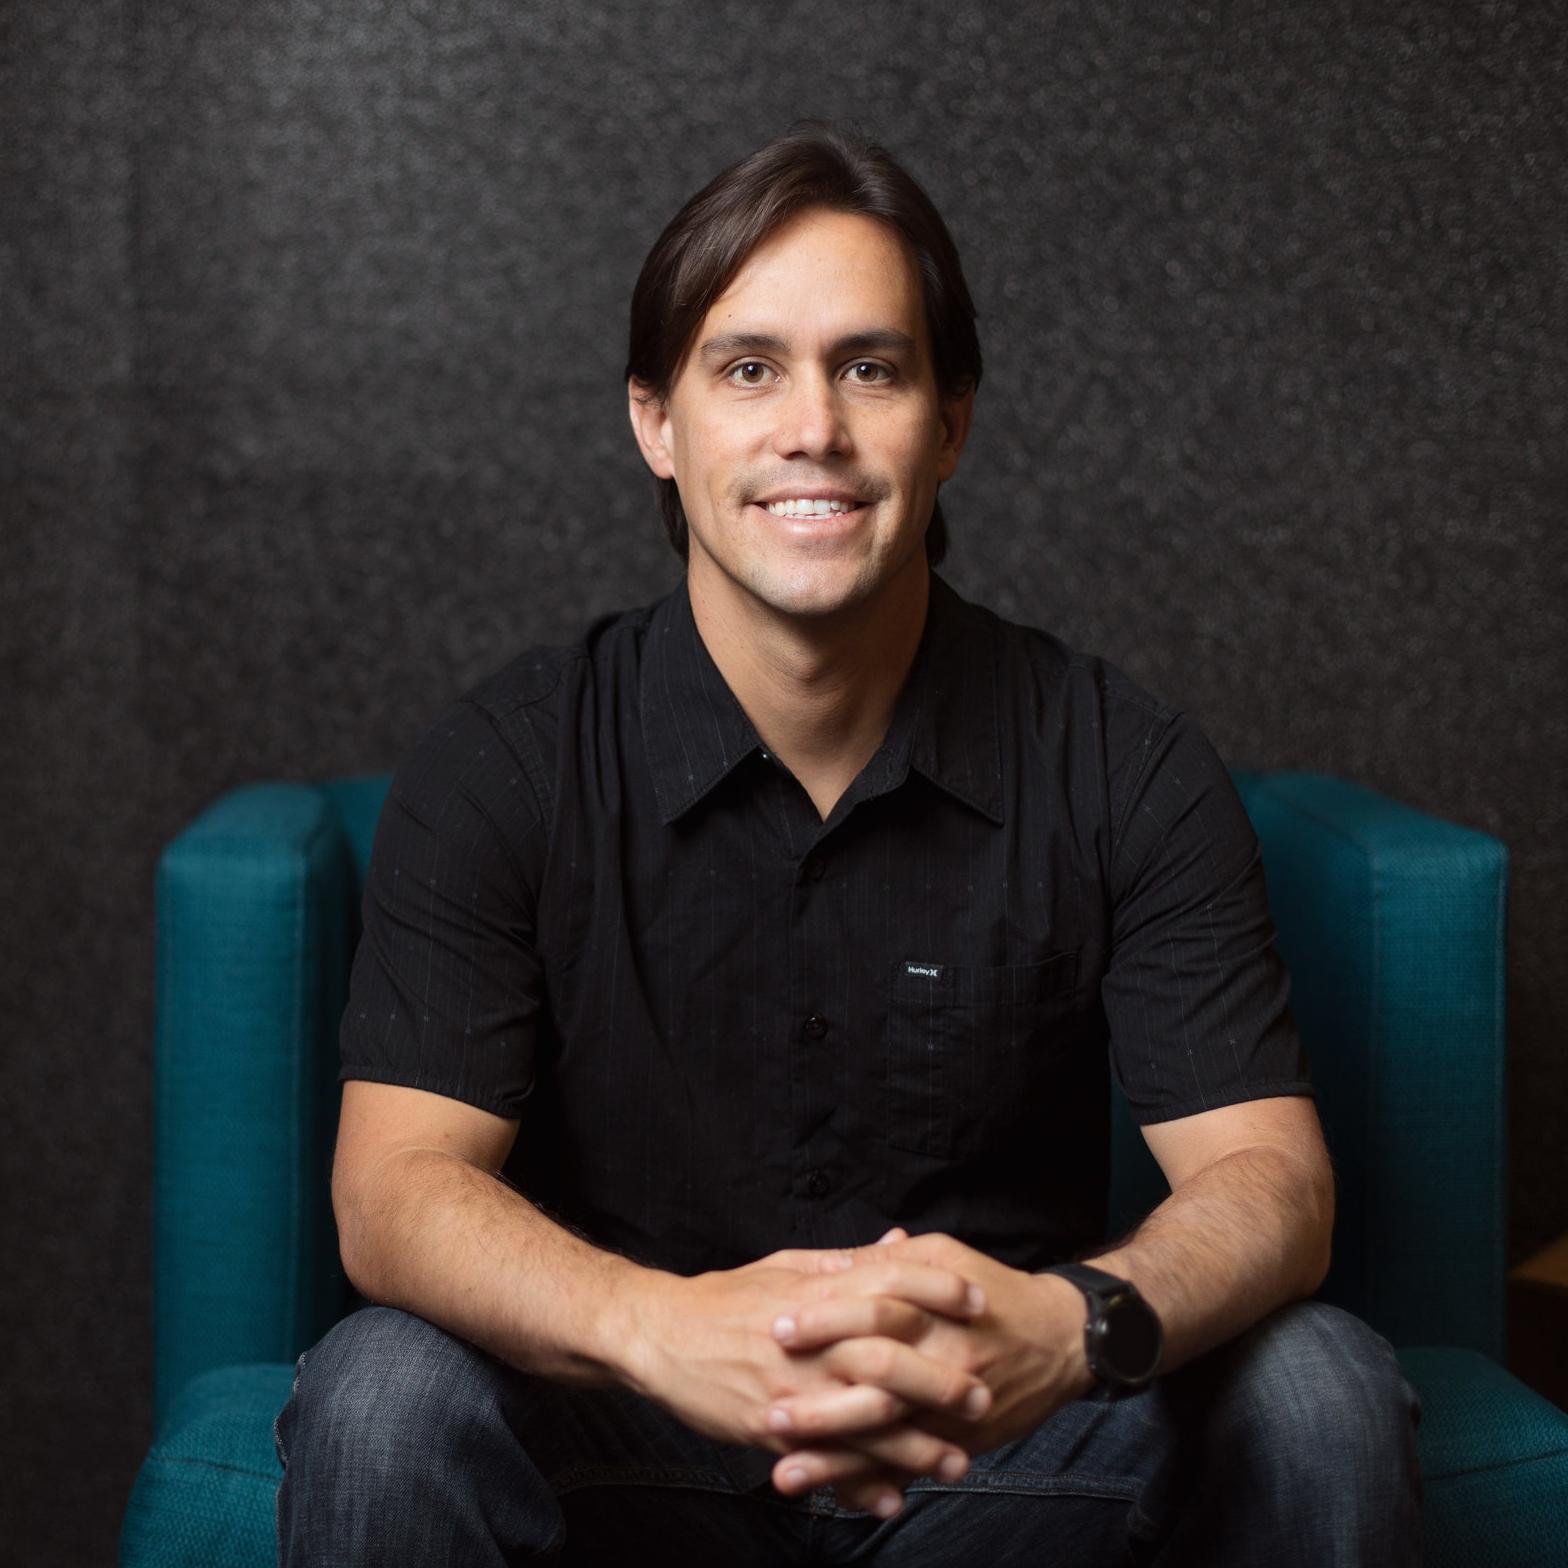 Demian Borba - Strategic Development Manager, AdobeView Full Bio